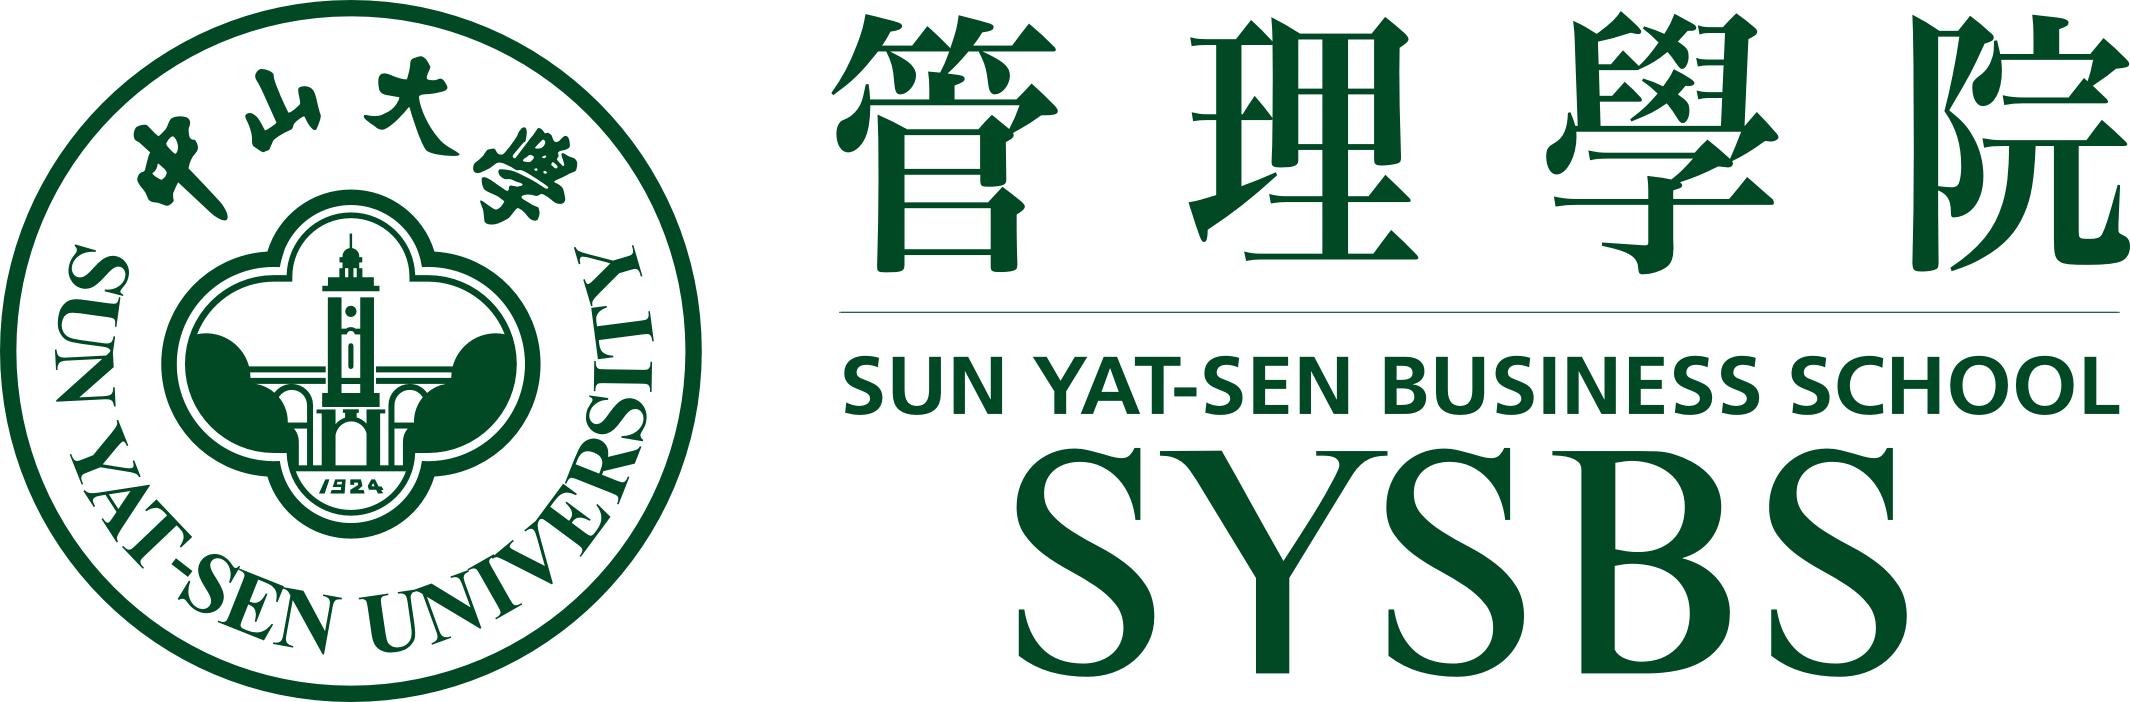 SYSU-BS Sun Yat-sen University